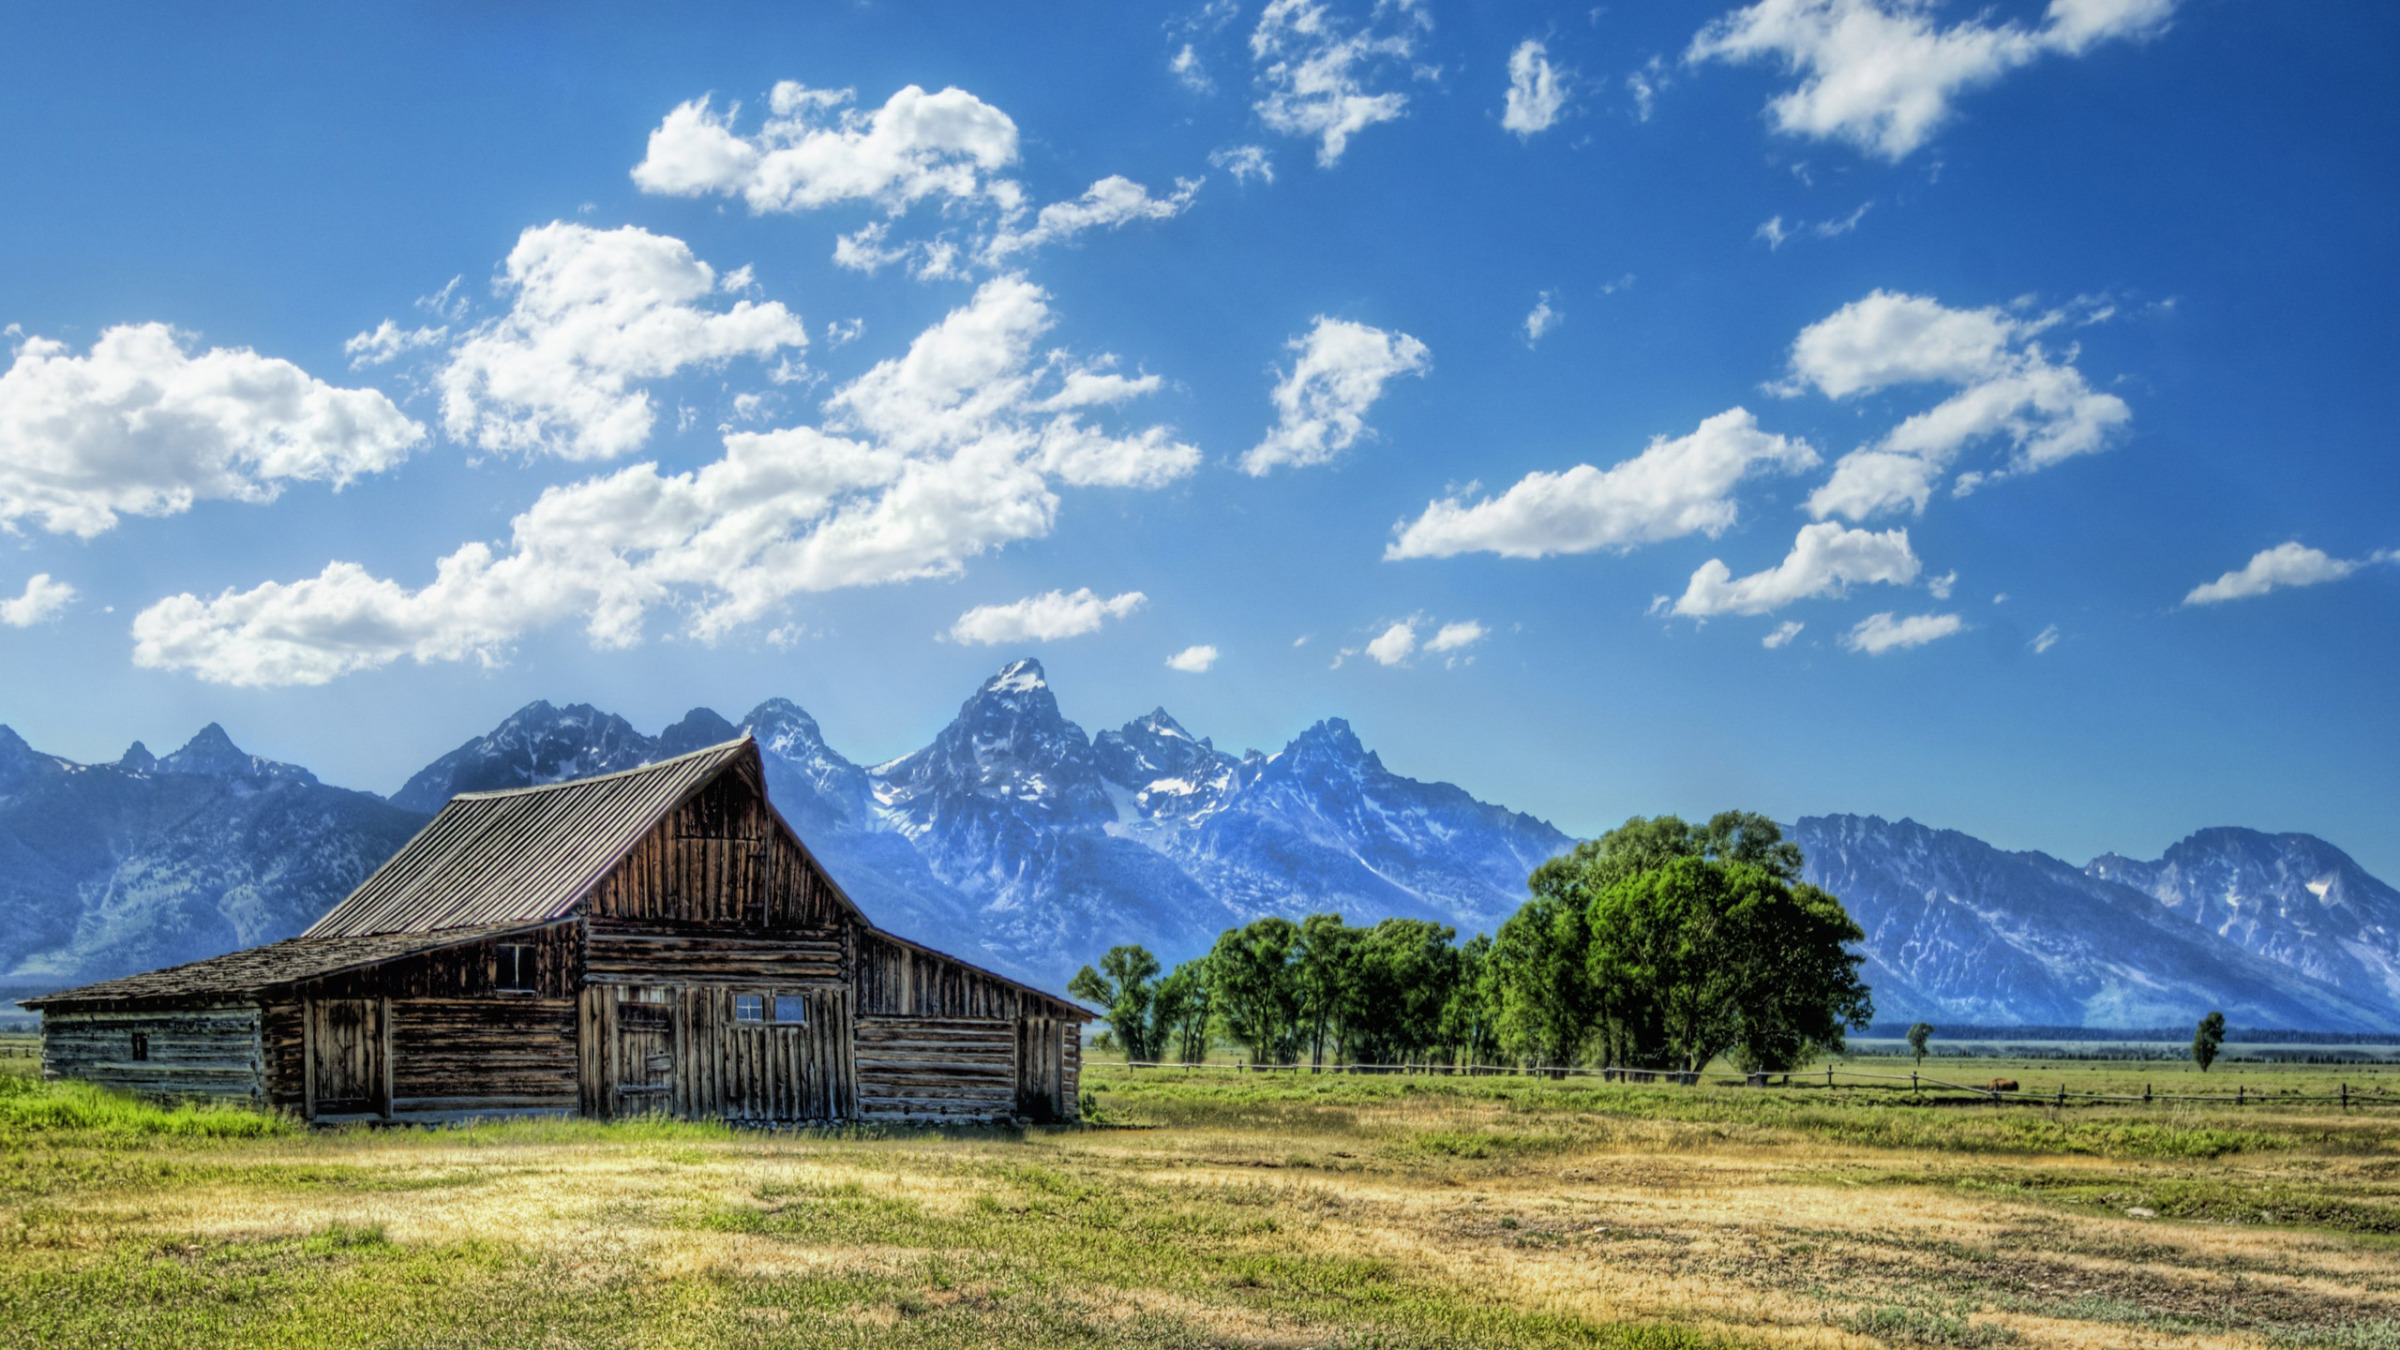 Wyoming Wallpaper 28659 1600x1200 px